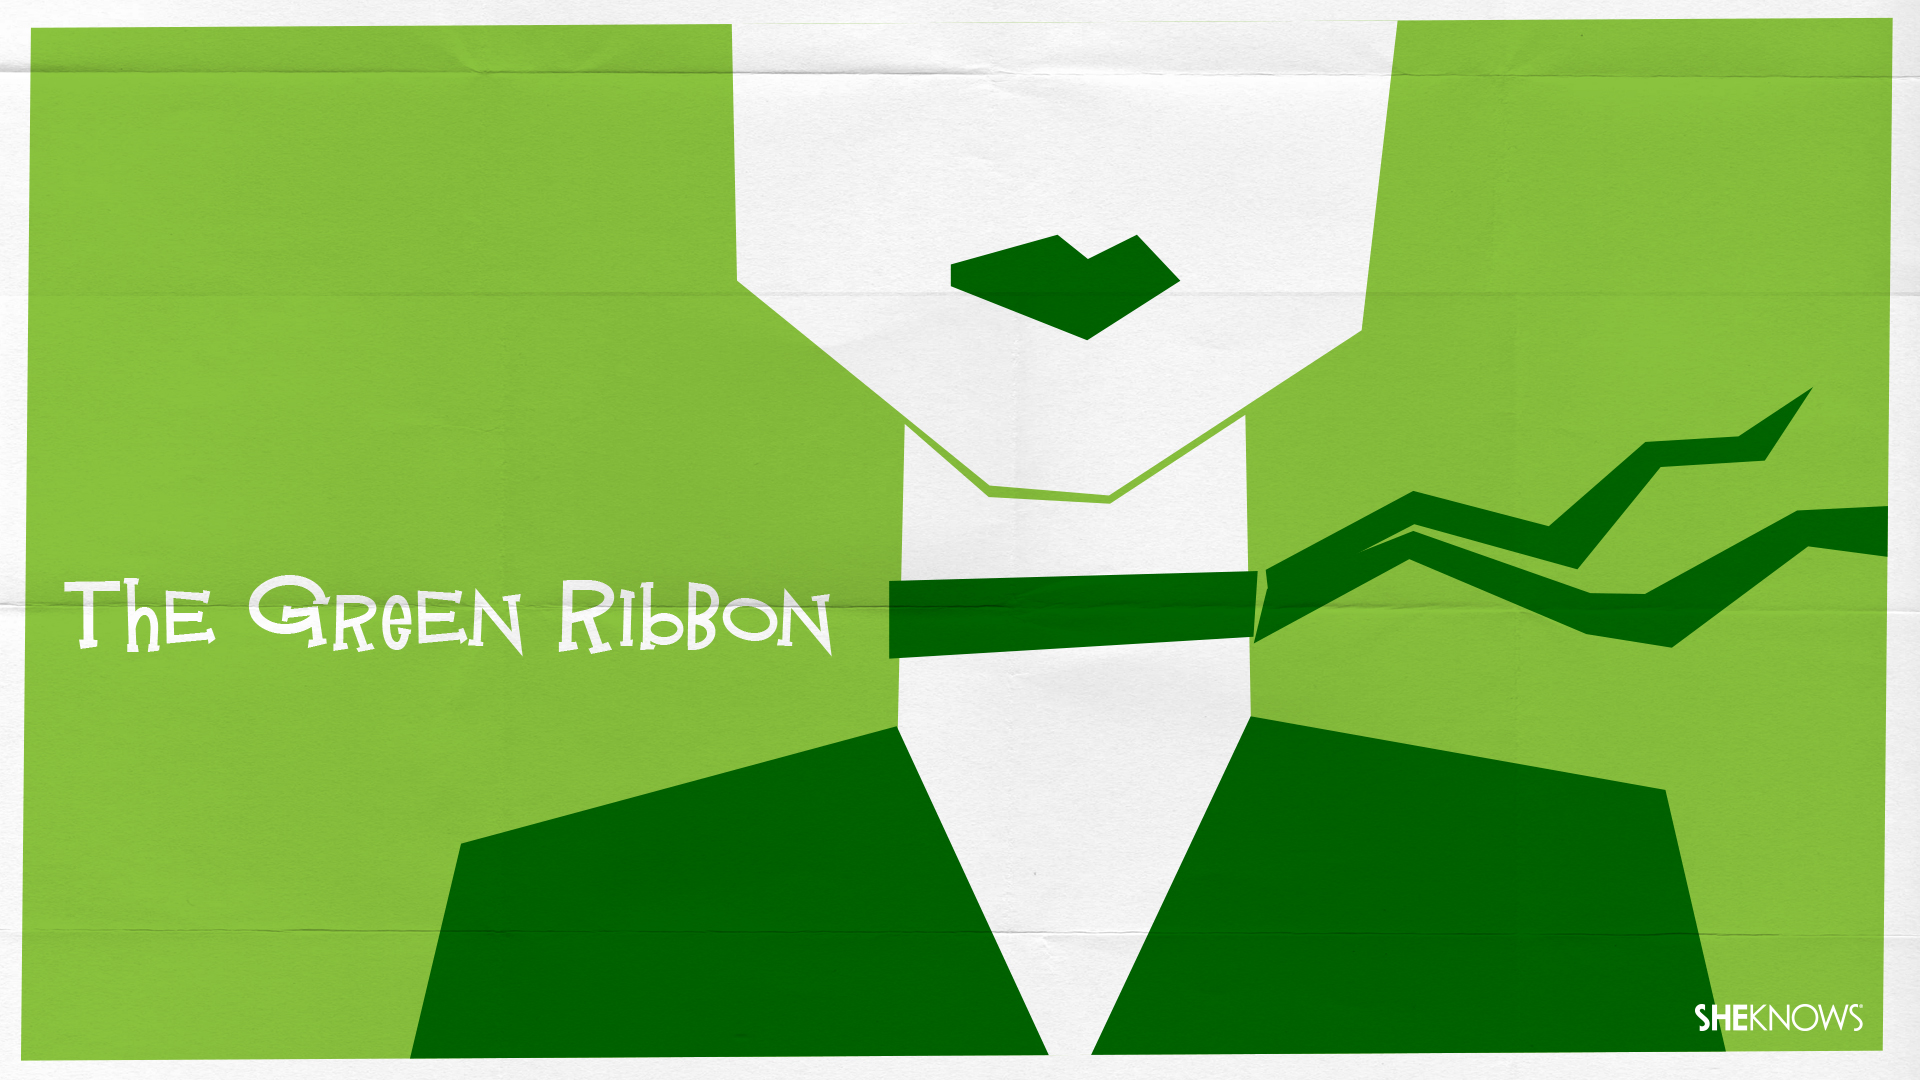 The Green Ribbon